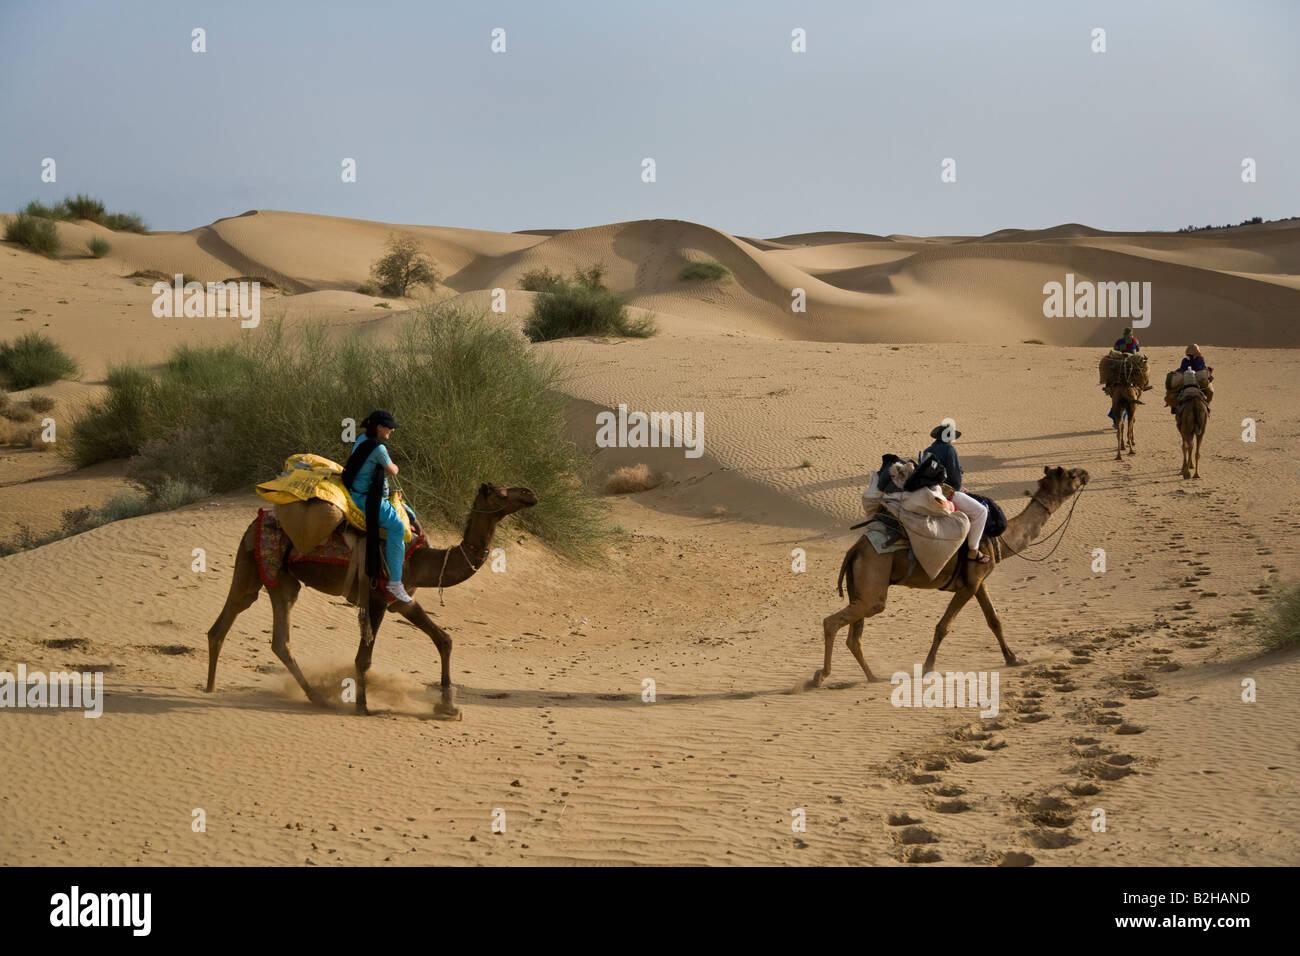 Image of: Dreamstime Travelers Ride Camels Through Sand Dunes In The Thar Desert Near Jaisalmer Rajasthan India Mr Alamy Travelers Ride Camels Through Sand Dunes In The Thar Desert Near